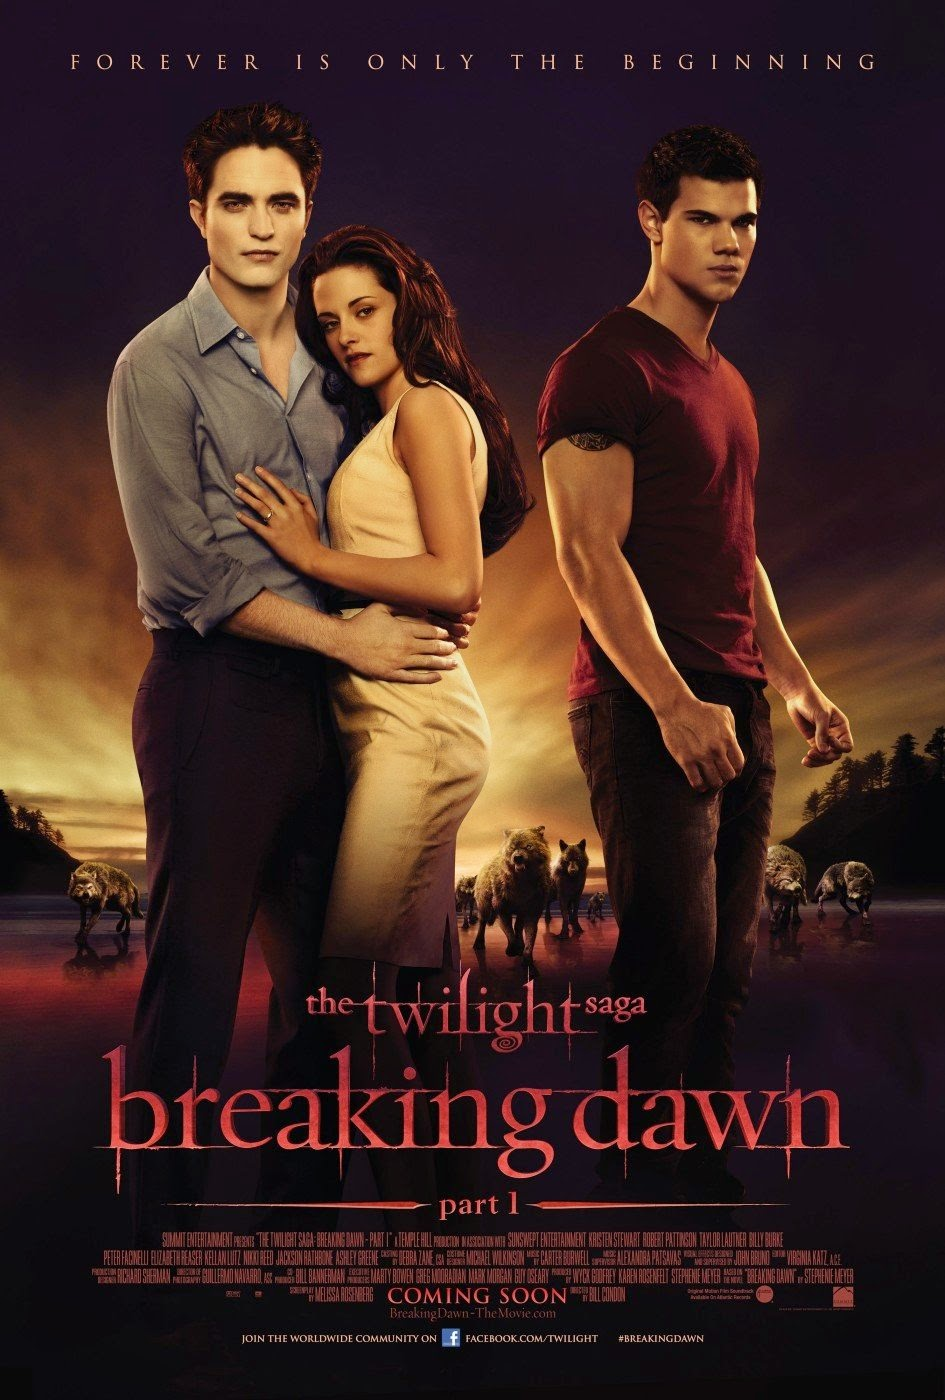 Twilight Saga Breaking Dawn Part 1  (2011) ταινιες online seires xrysoi greek subs